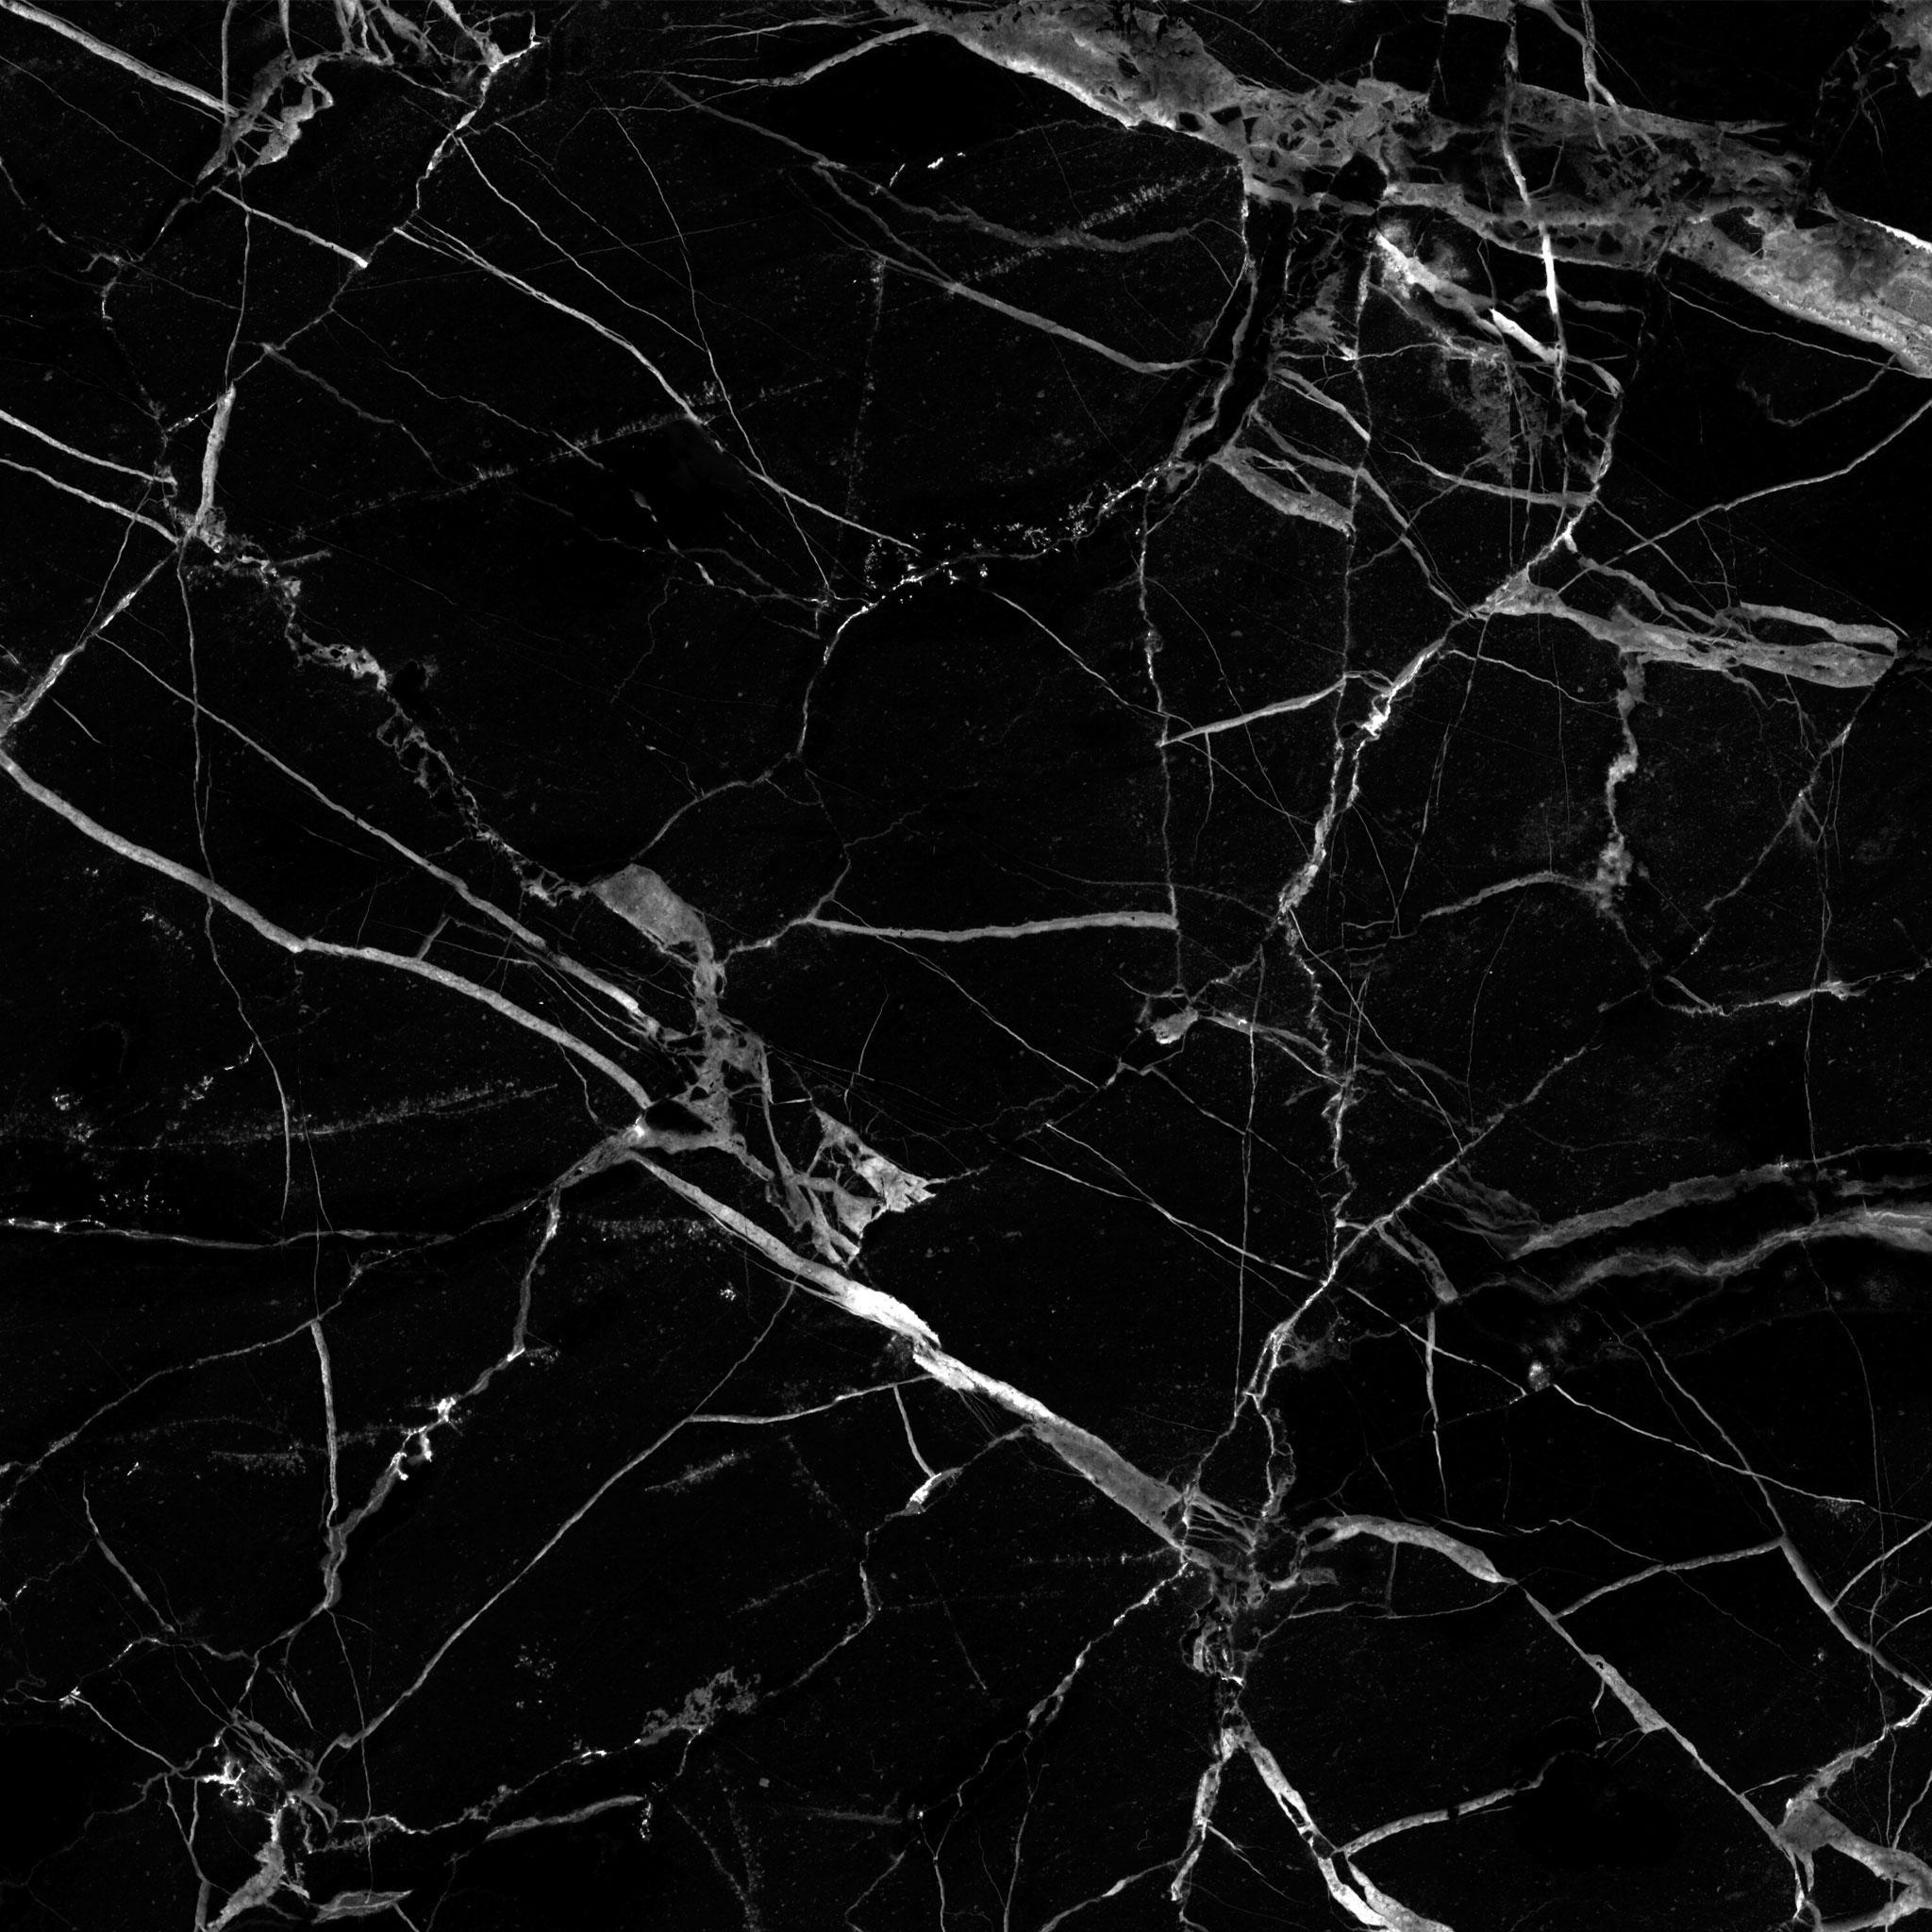 Good Wallpaper Marble Ios - uGMNX9  Perfect Image Reference_183925.jpg